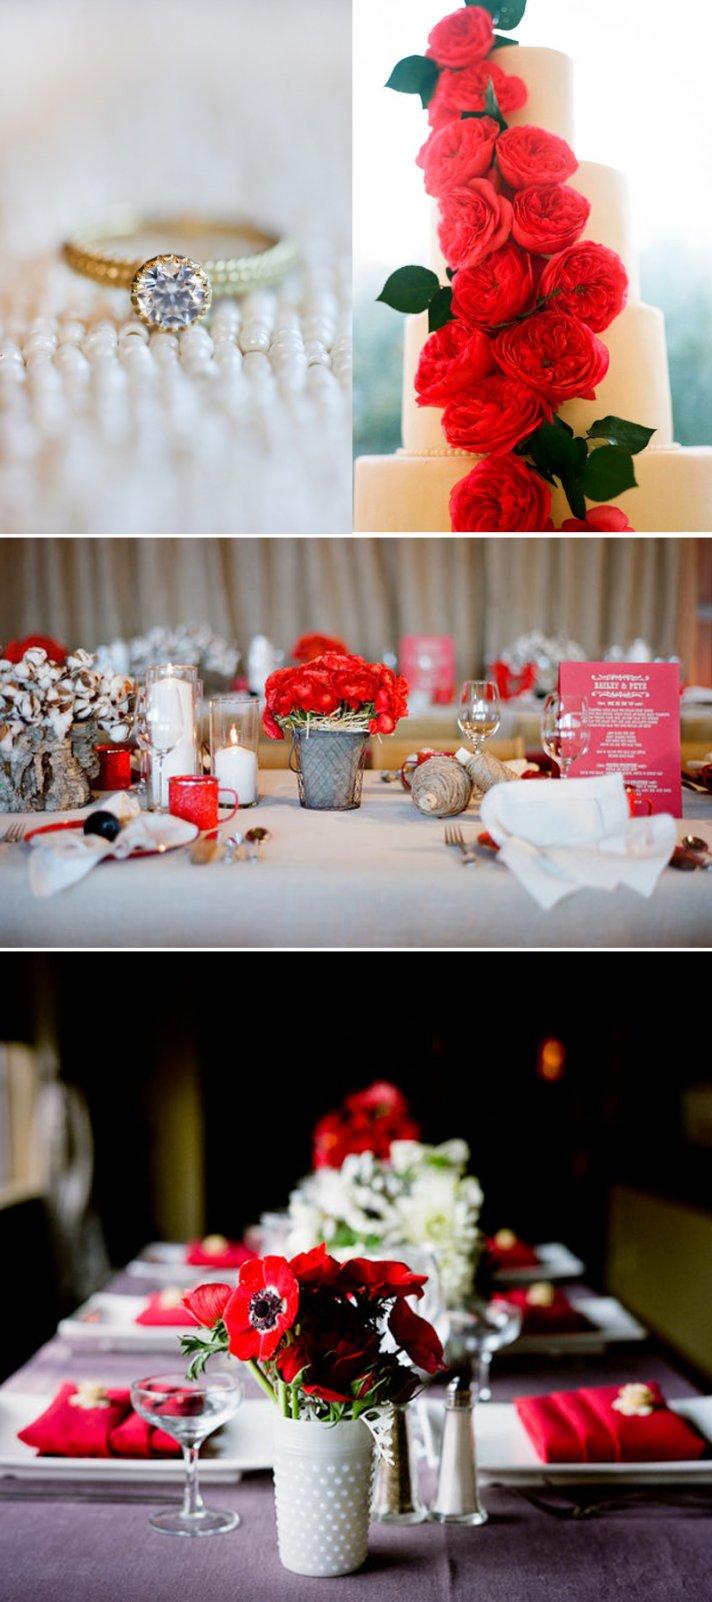 Wedding Color Ideas 26 Fabulous wedding color ideas red